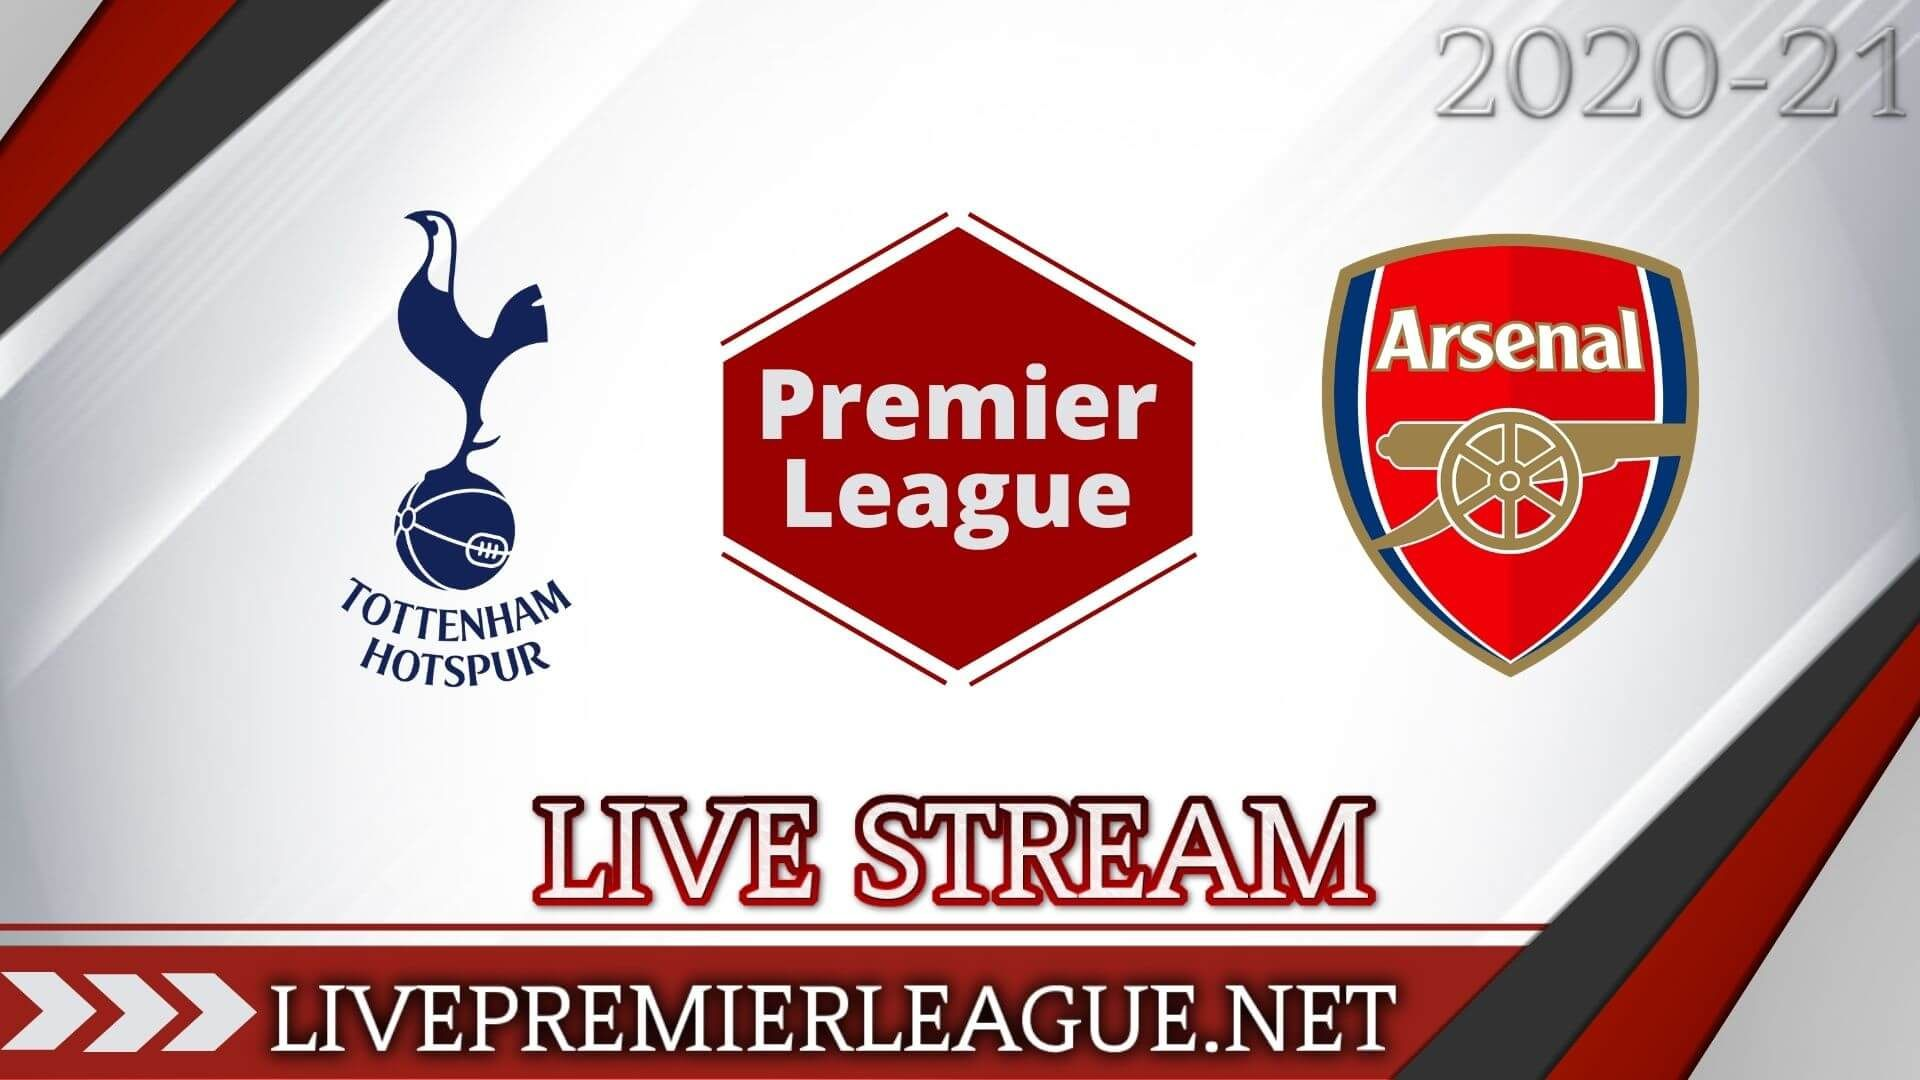 Tottenham Hotspur Vs Arsenal Live Stream 2020 Week 11 Tottenham Hotspur Arsenal Live Upcoming Matches